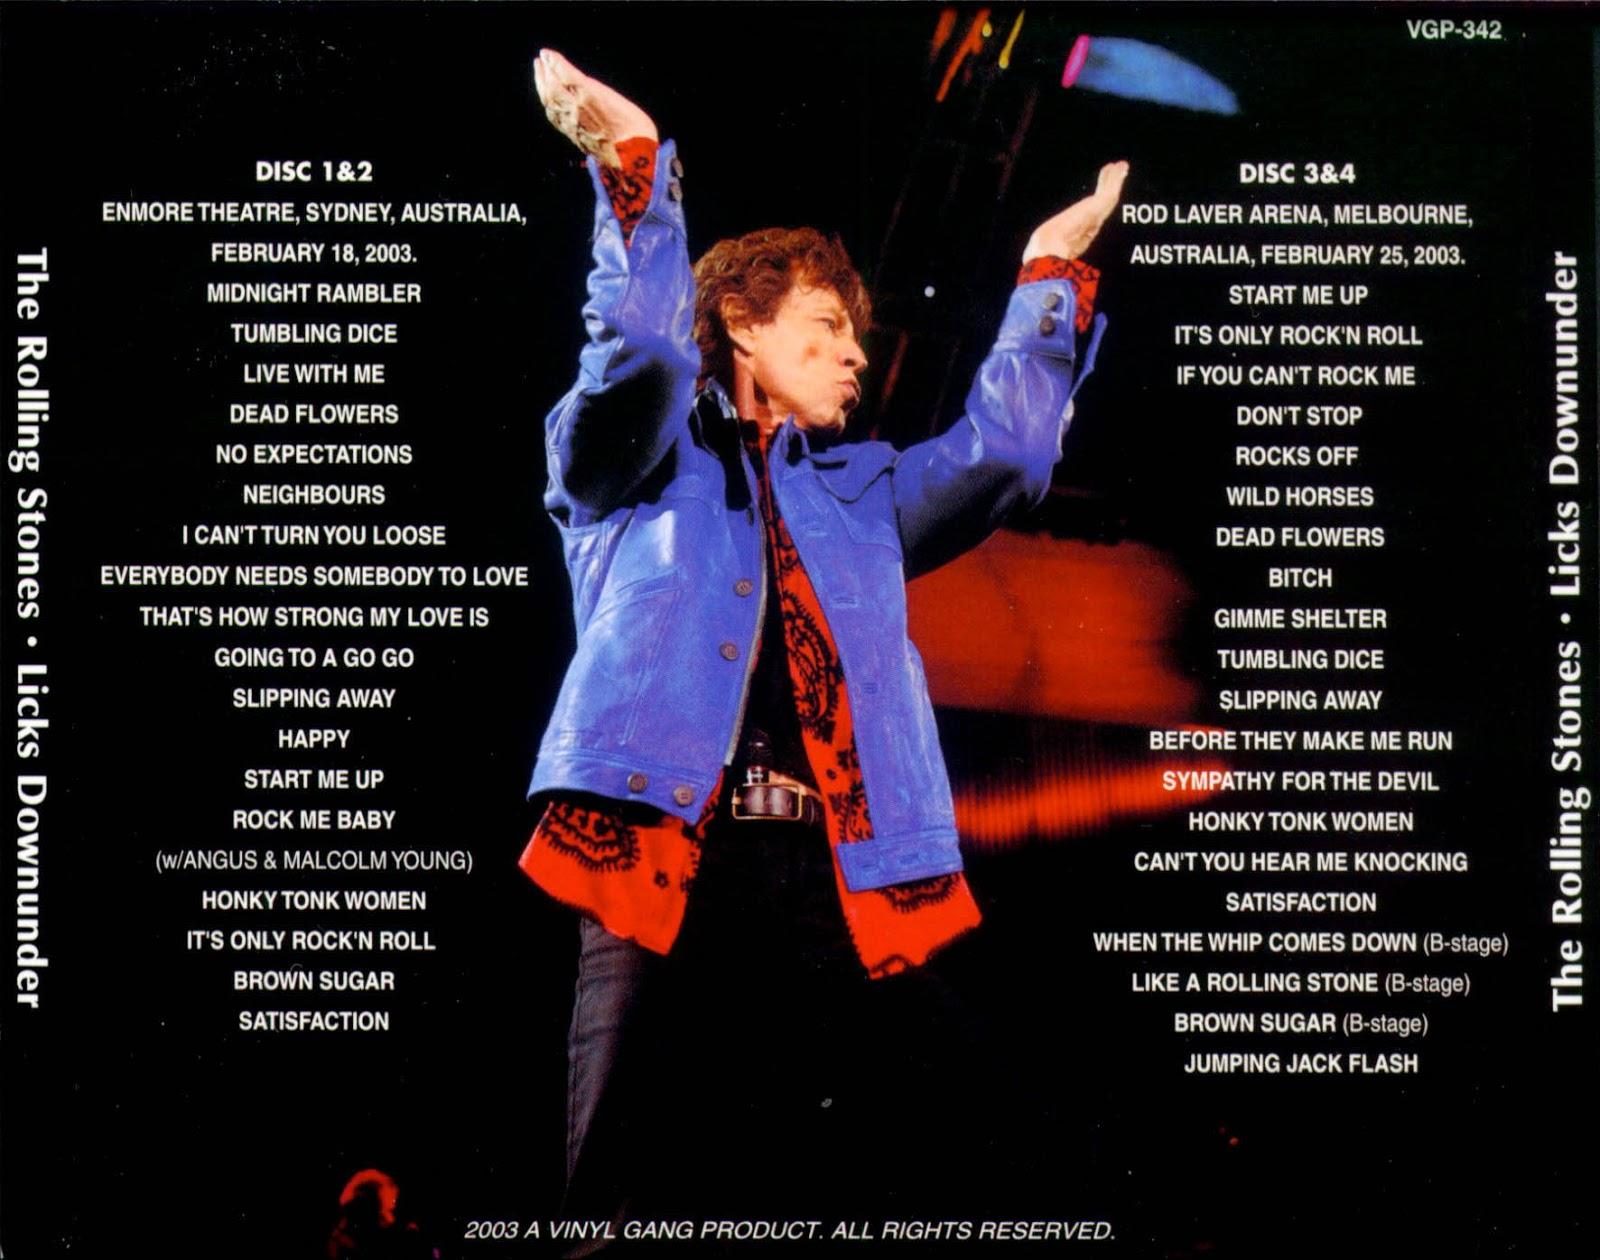 Bootleg Rambler: The Rolling Stones - 2003-02-18 Sydney+2003